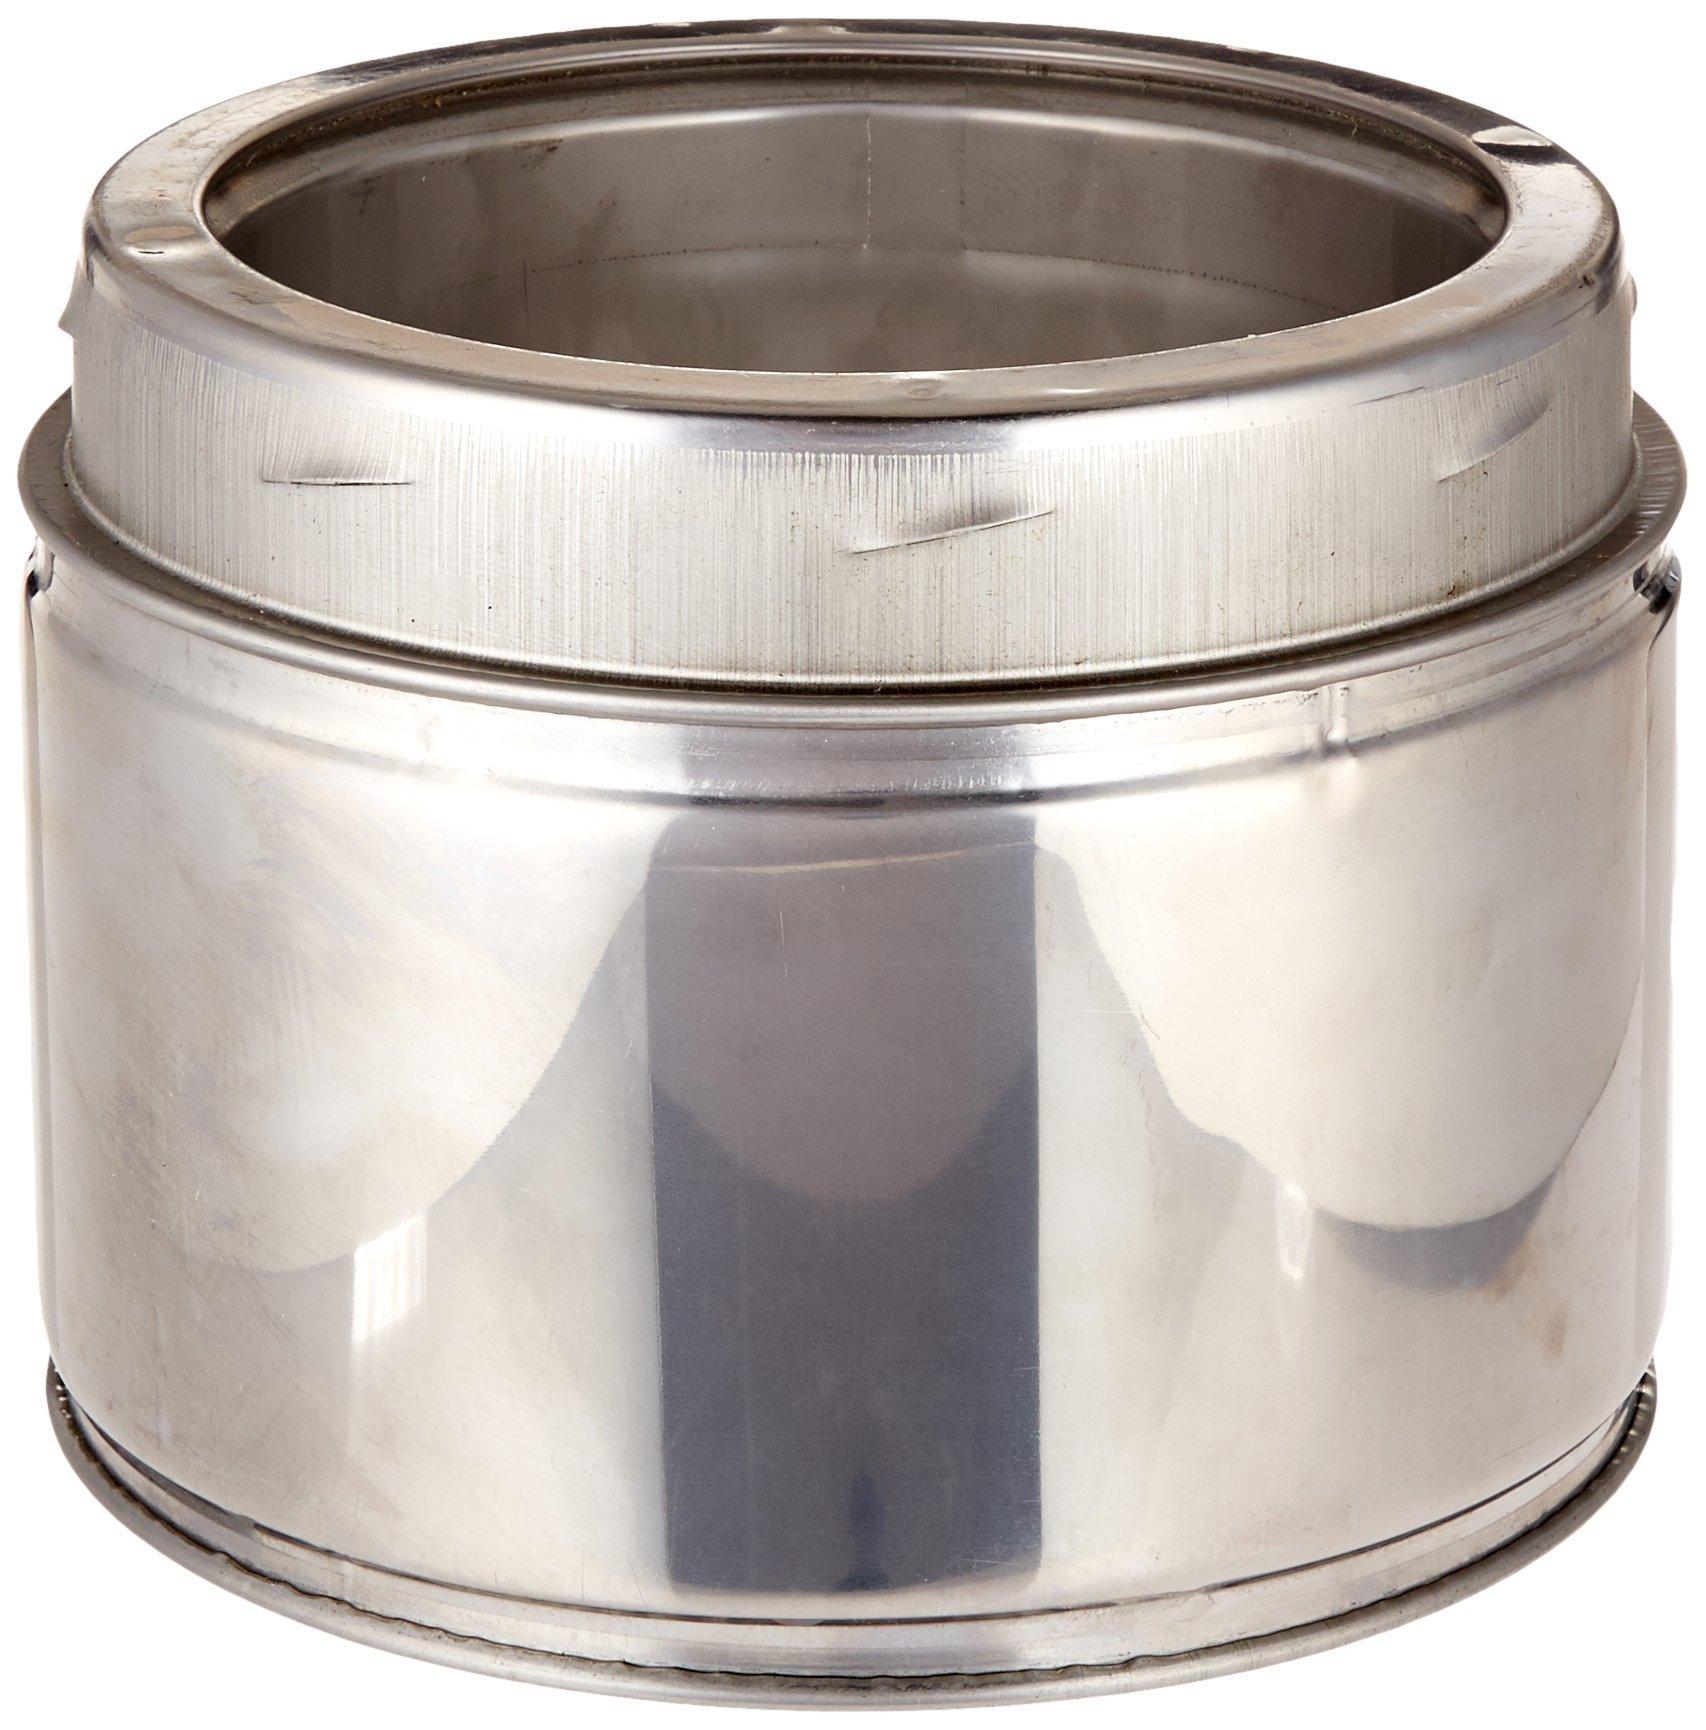 Selkirk Metalbestos 6UT-6 6-Inch X 6-Inch Stainless Steel Insulated Chimney Pipe